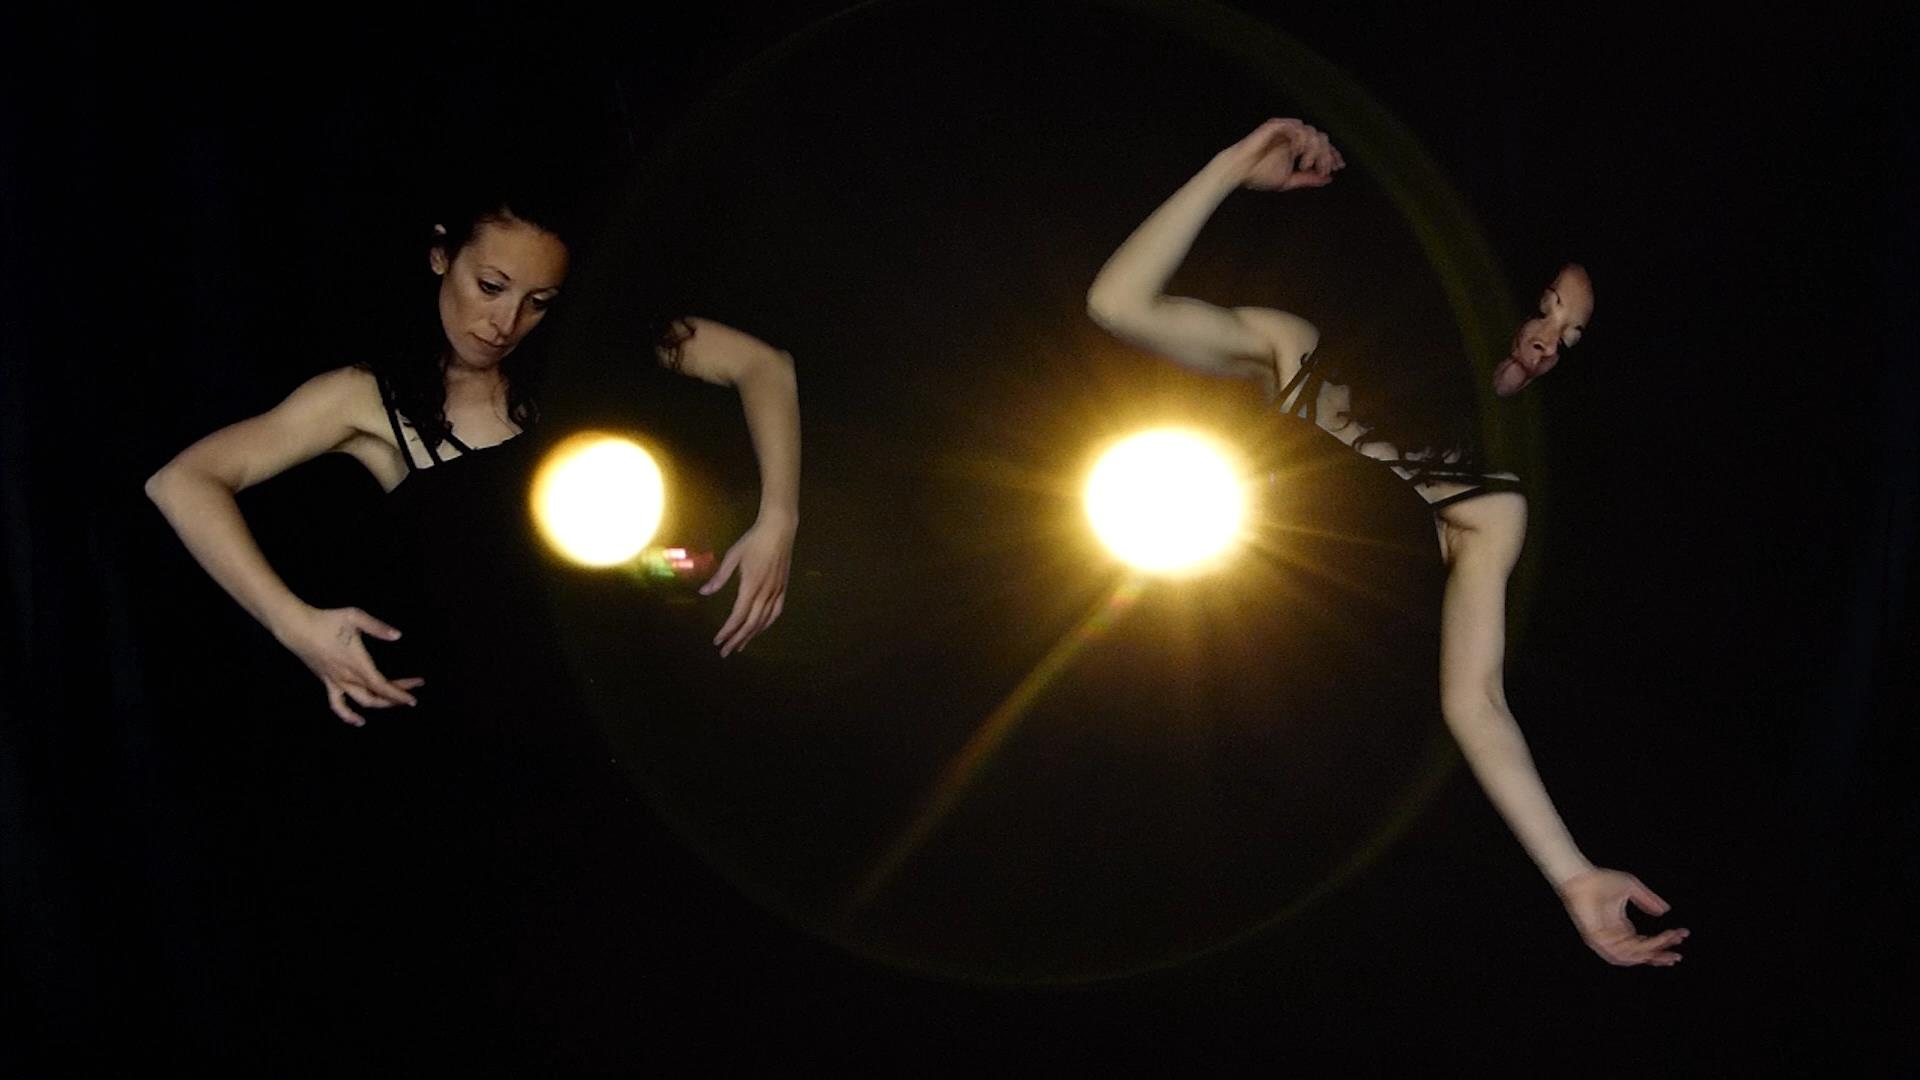 La Guida - Visto con voi: Elisa Spagone danza Enomisossab